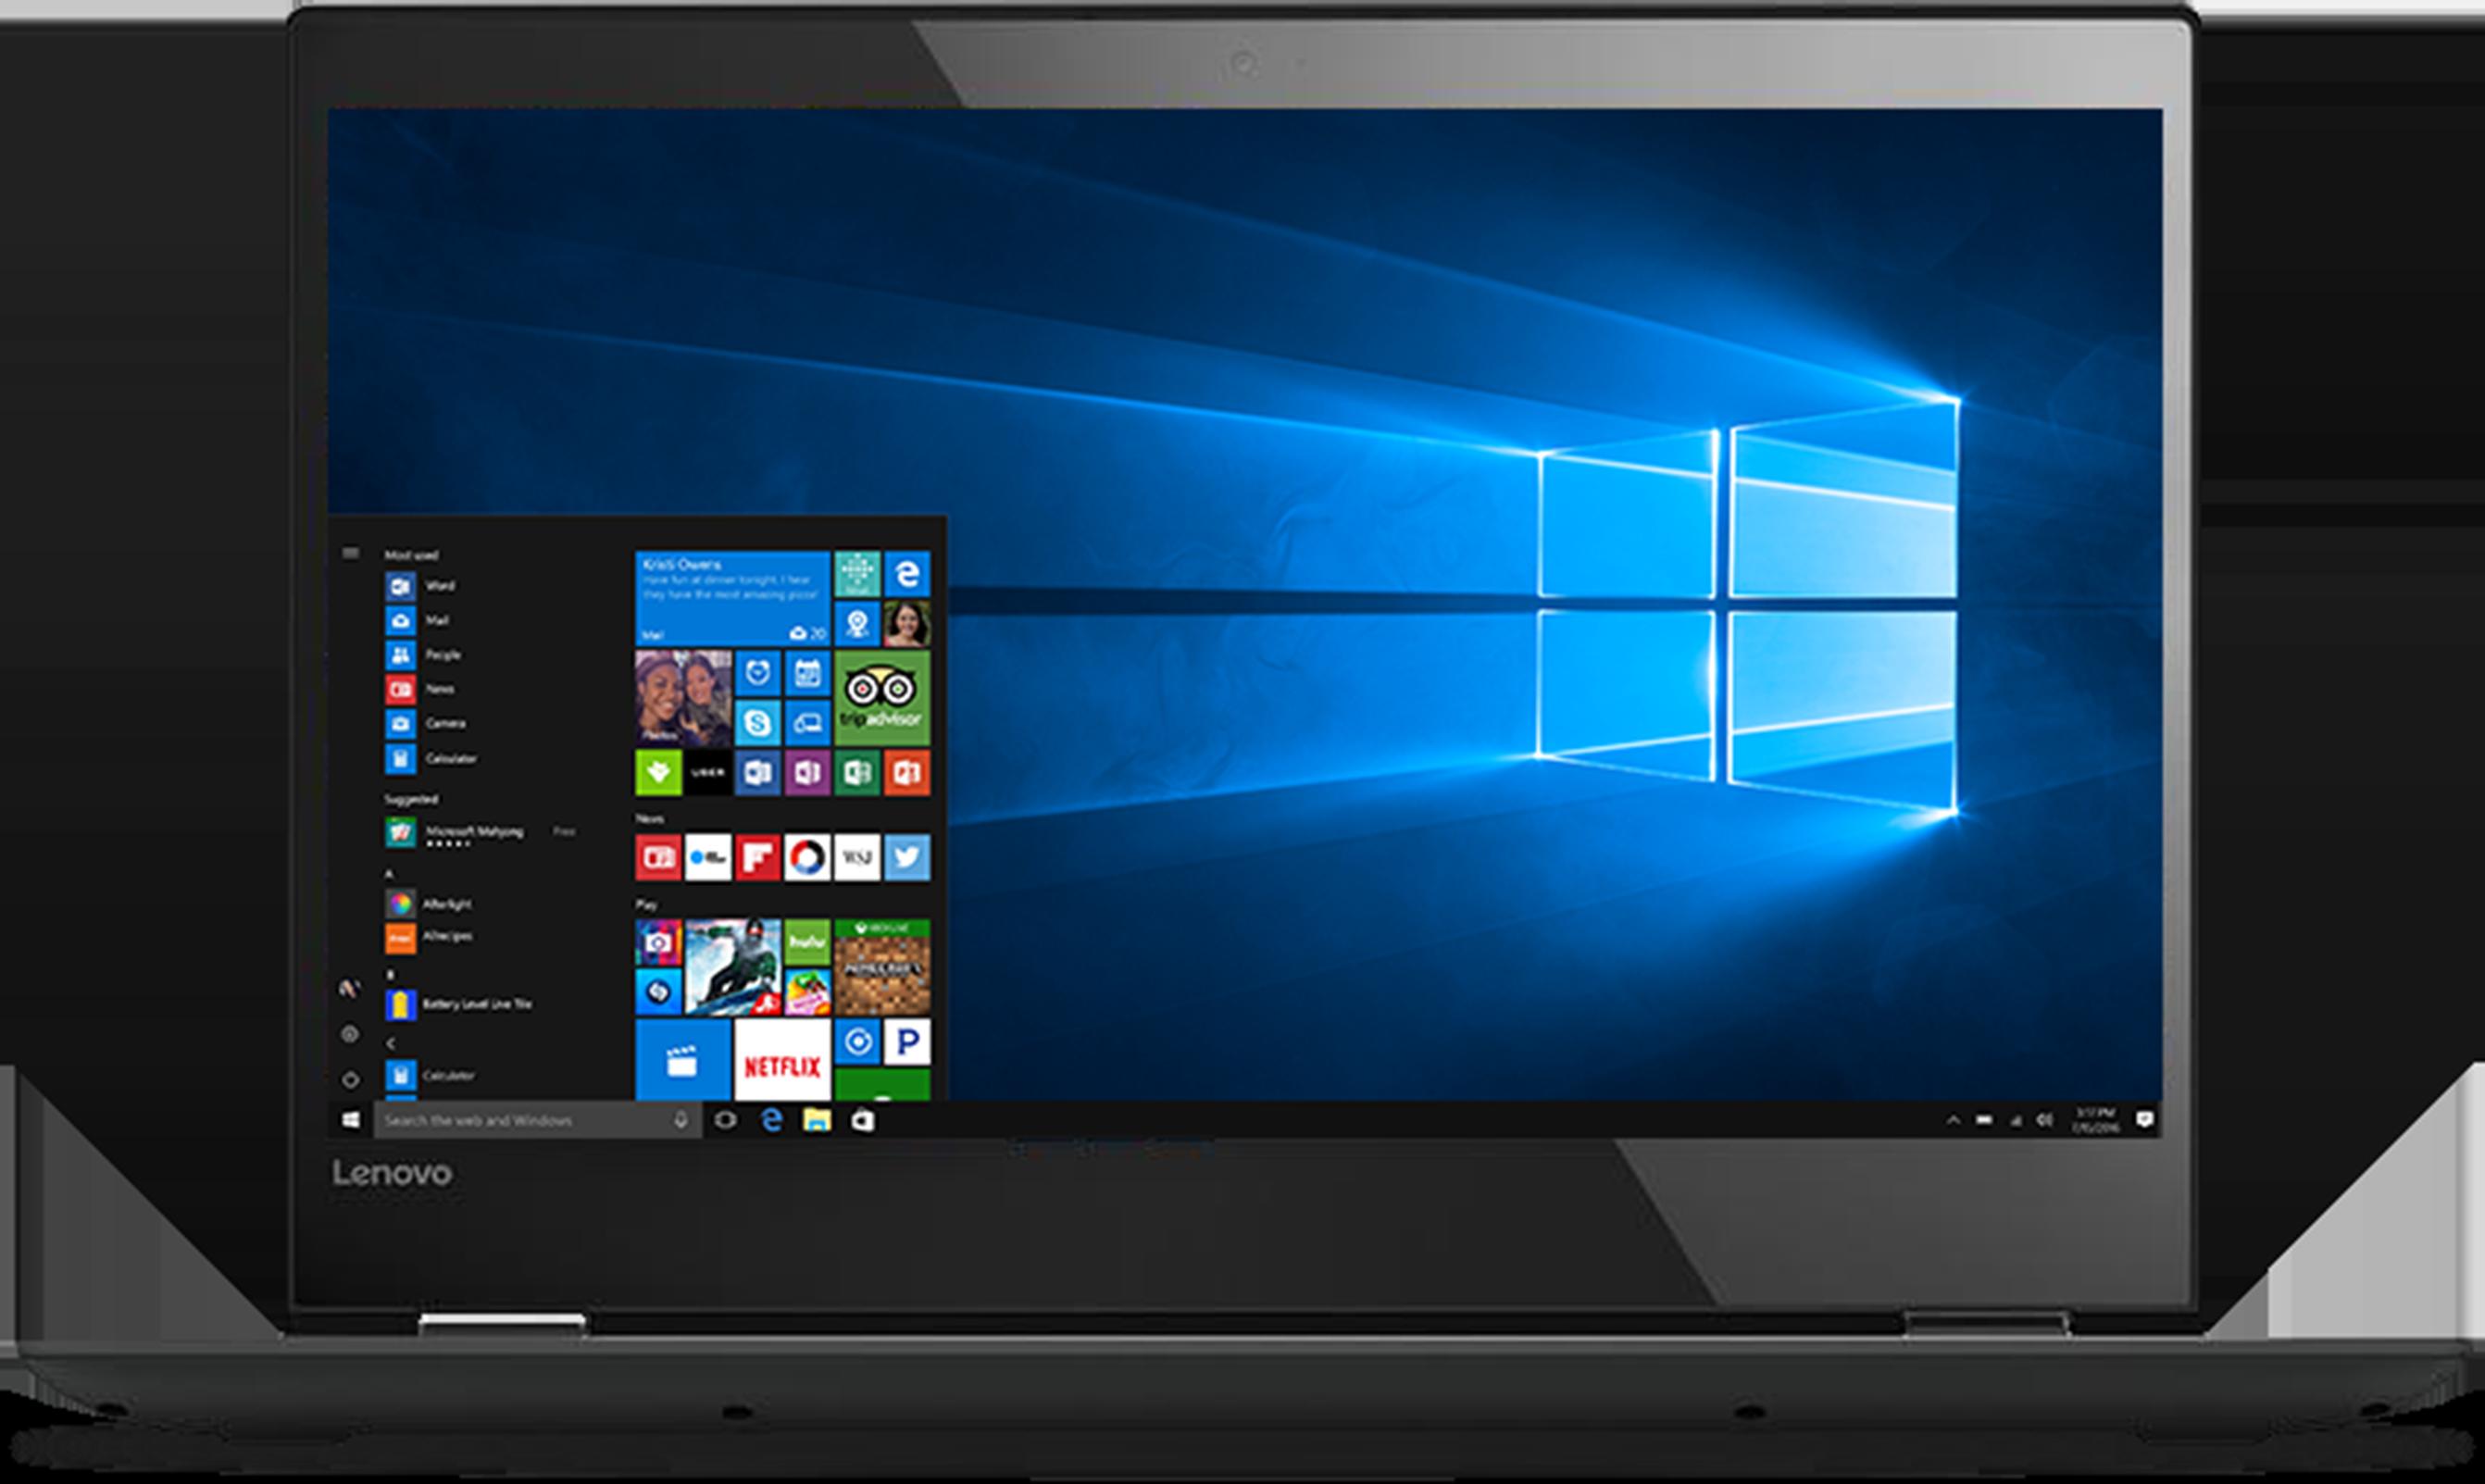 Lenovo Ideapad Flex 5 14 80XA000UUS 2 in 1 PC